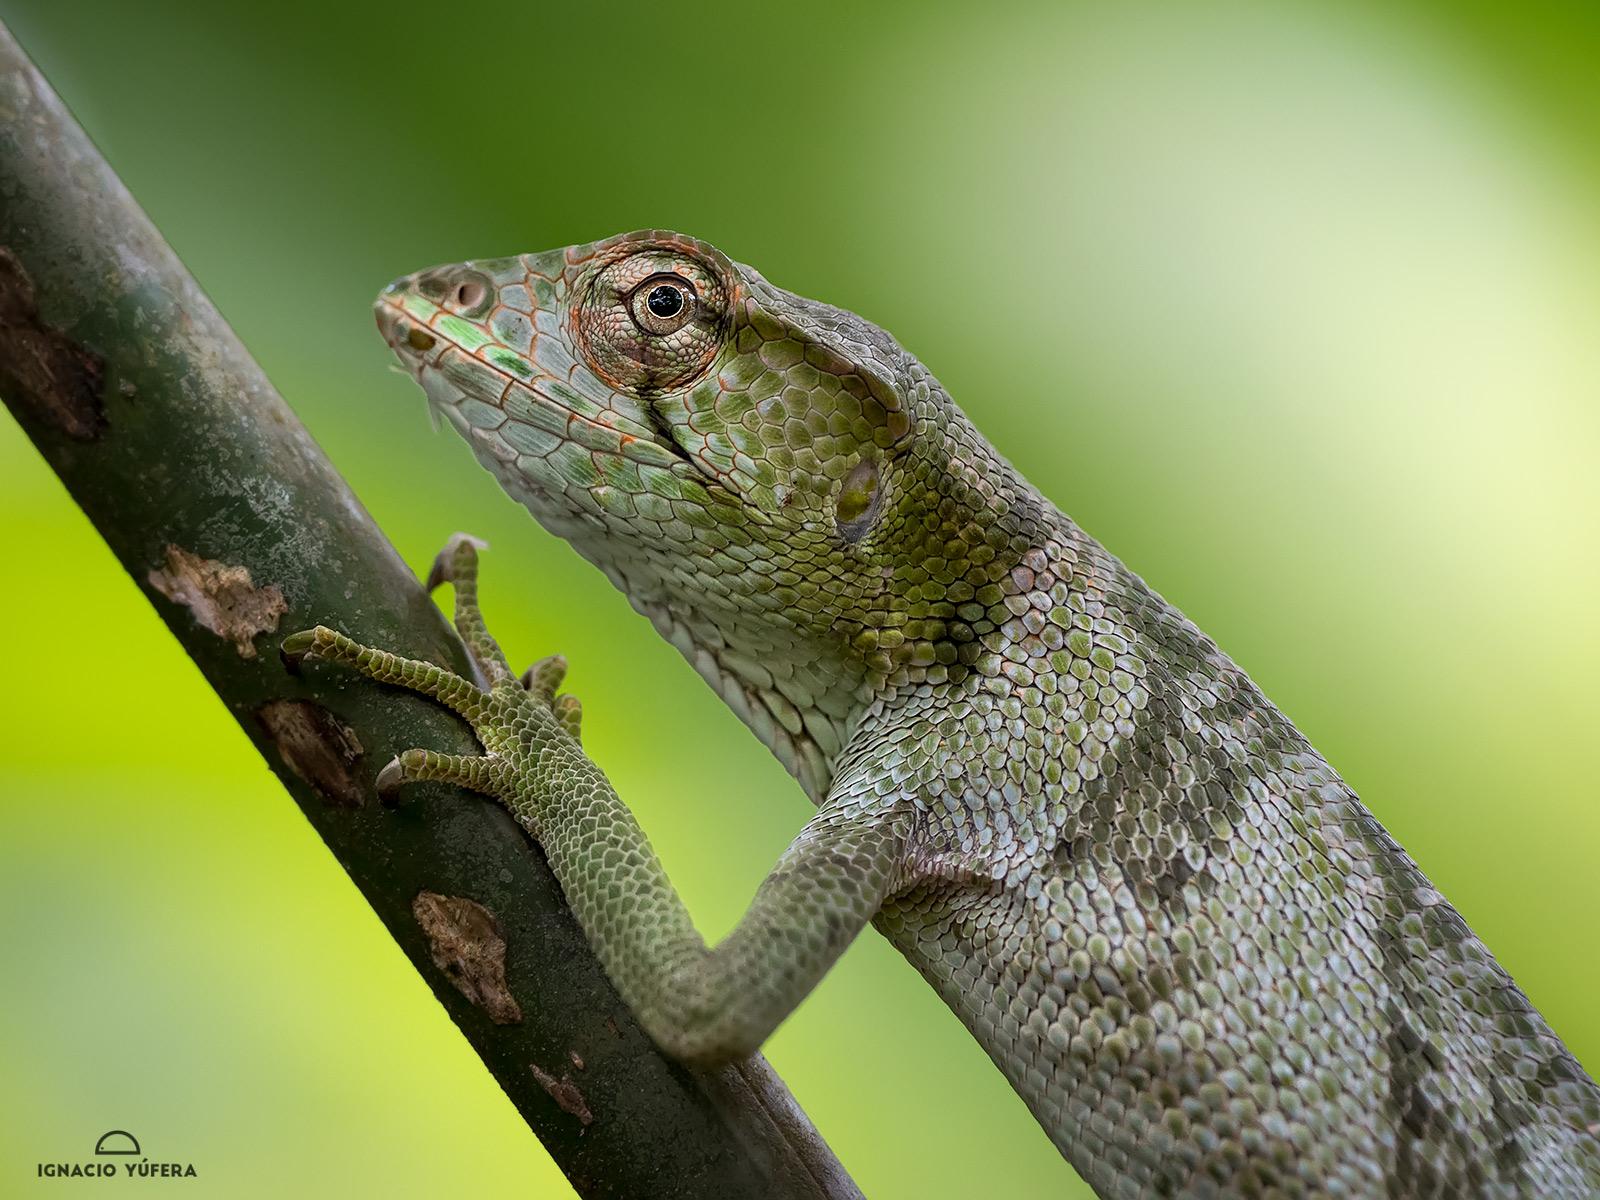 Canopy lizard (Polychrus gutturosus), Gamboa, Panama